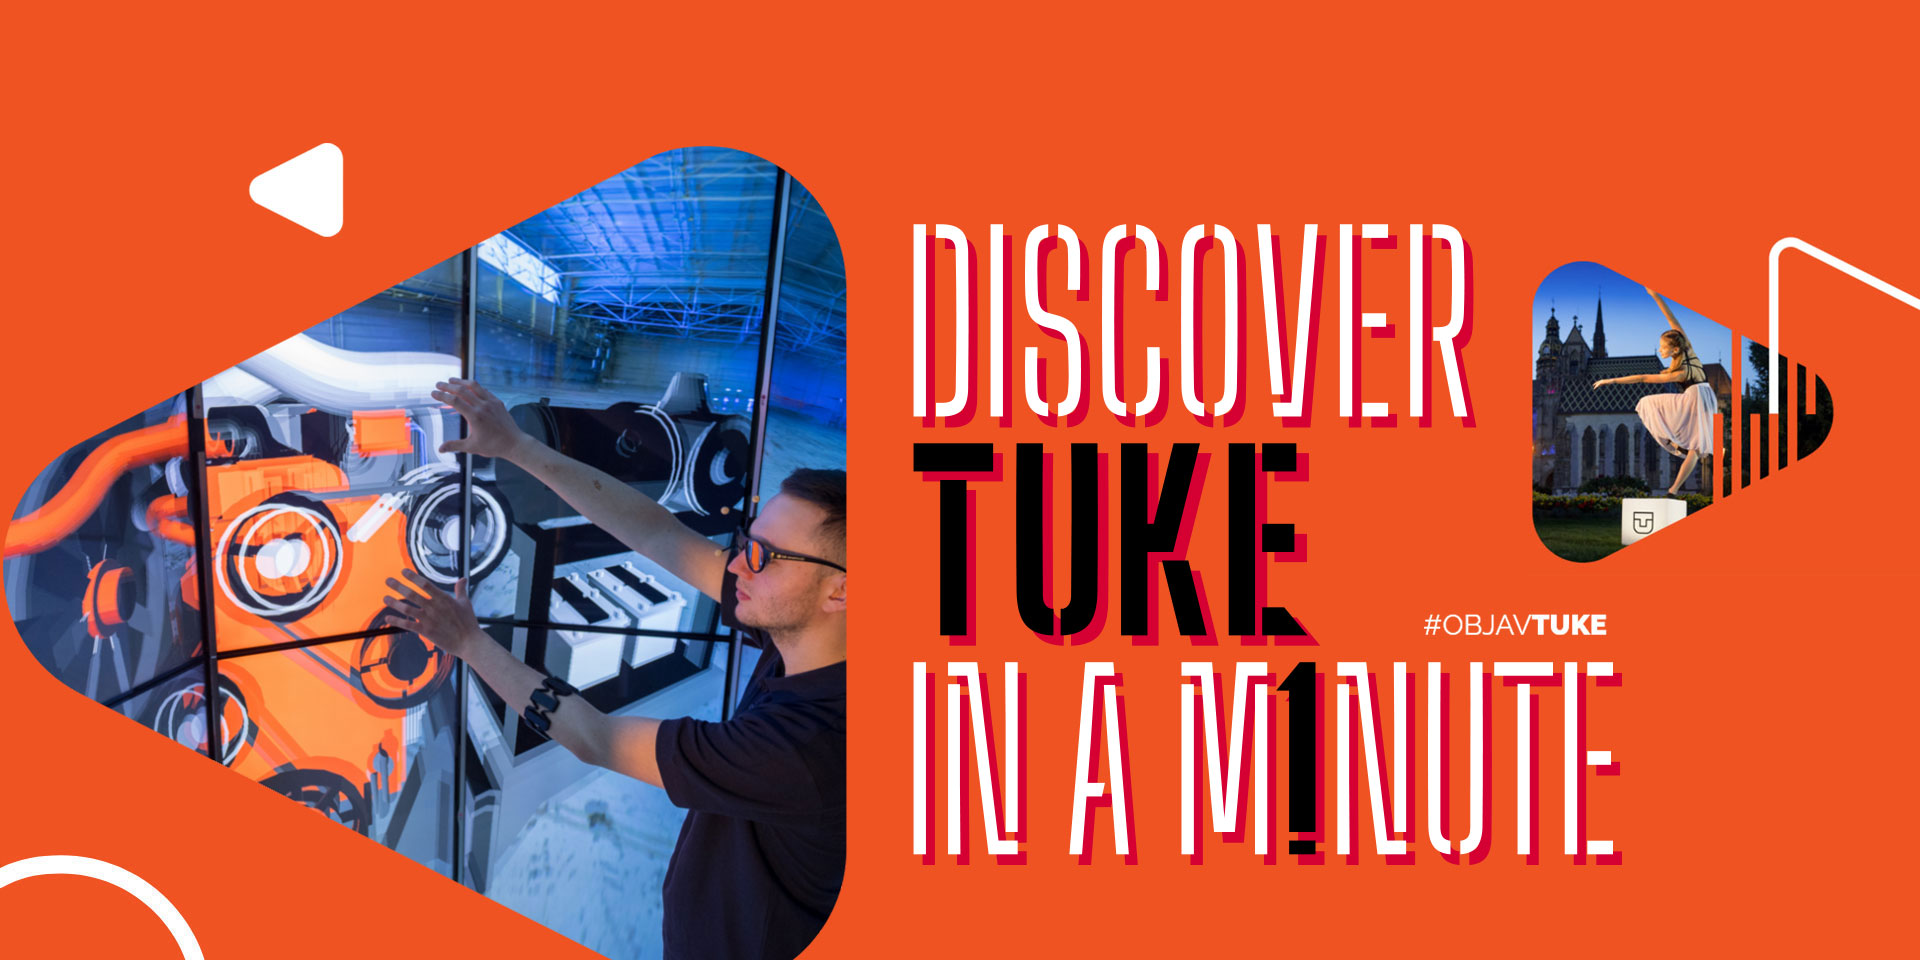 Objav TUKE za minutu / Discover TUKE in a Minute